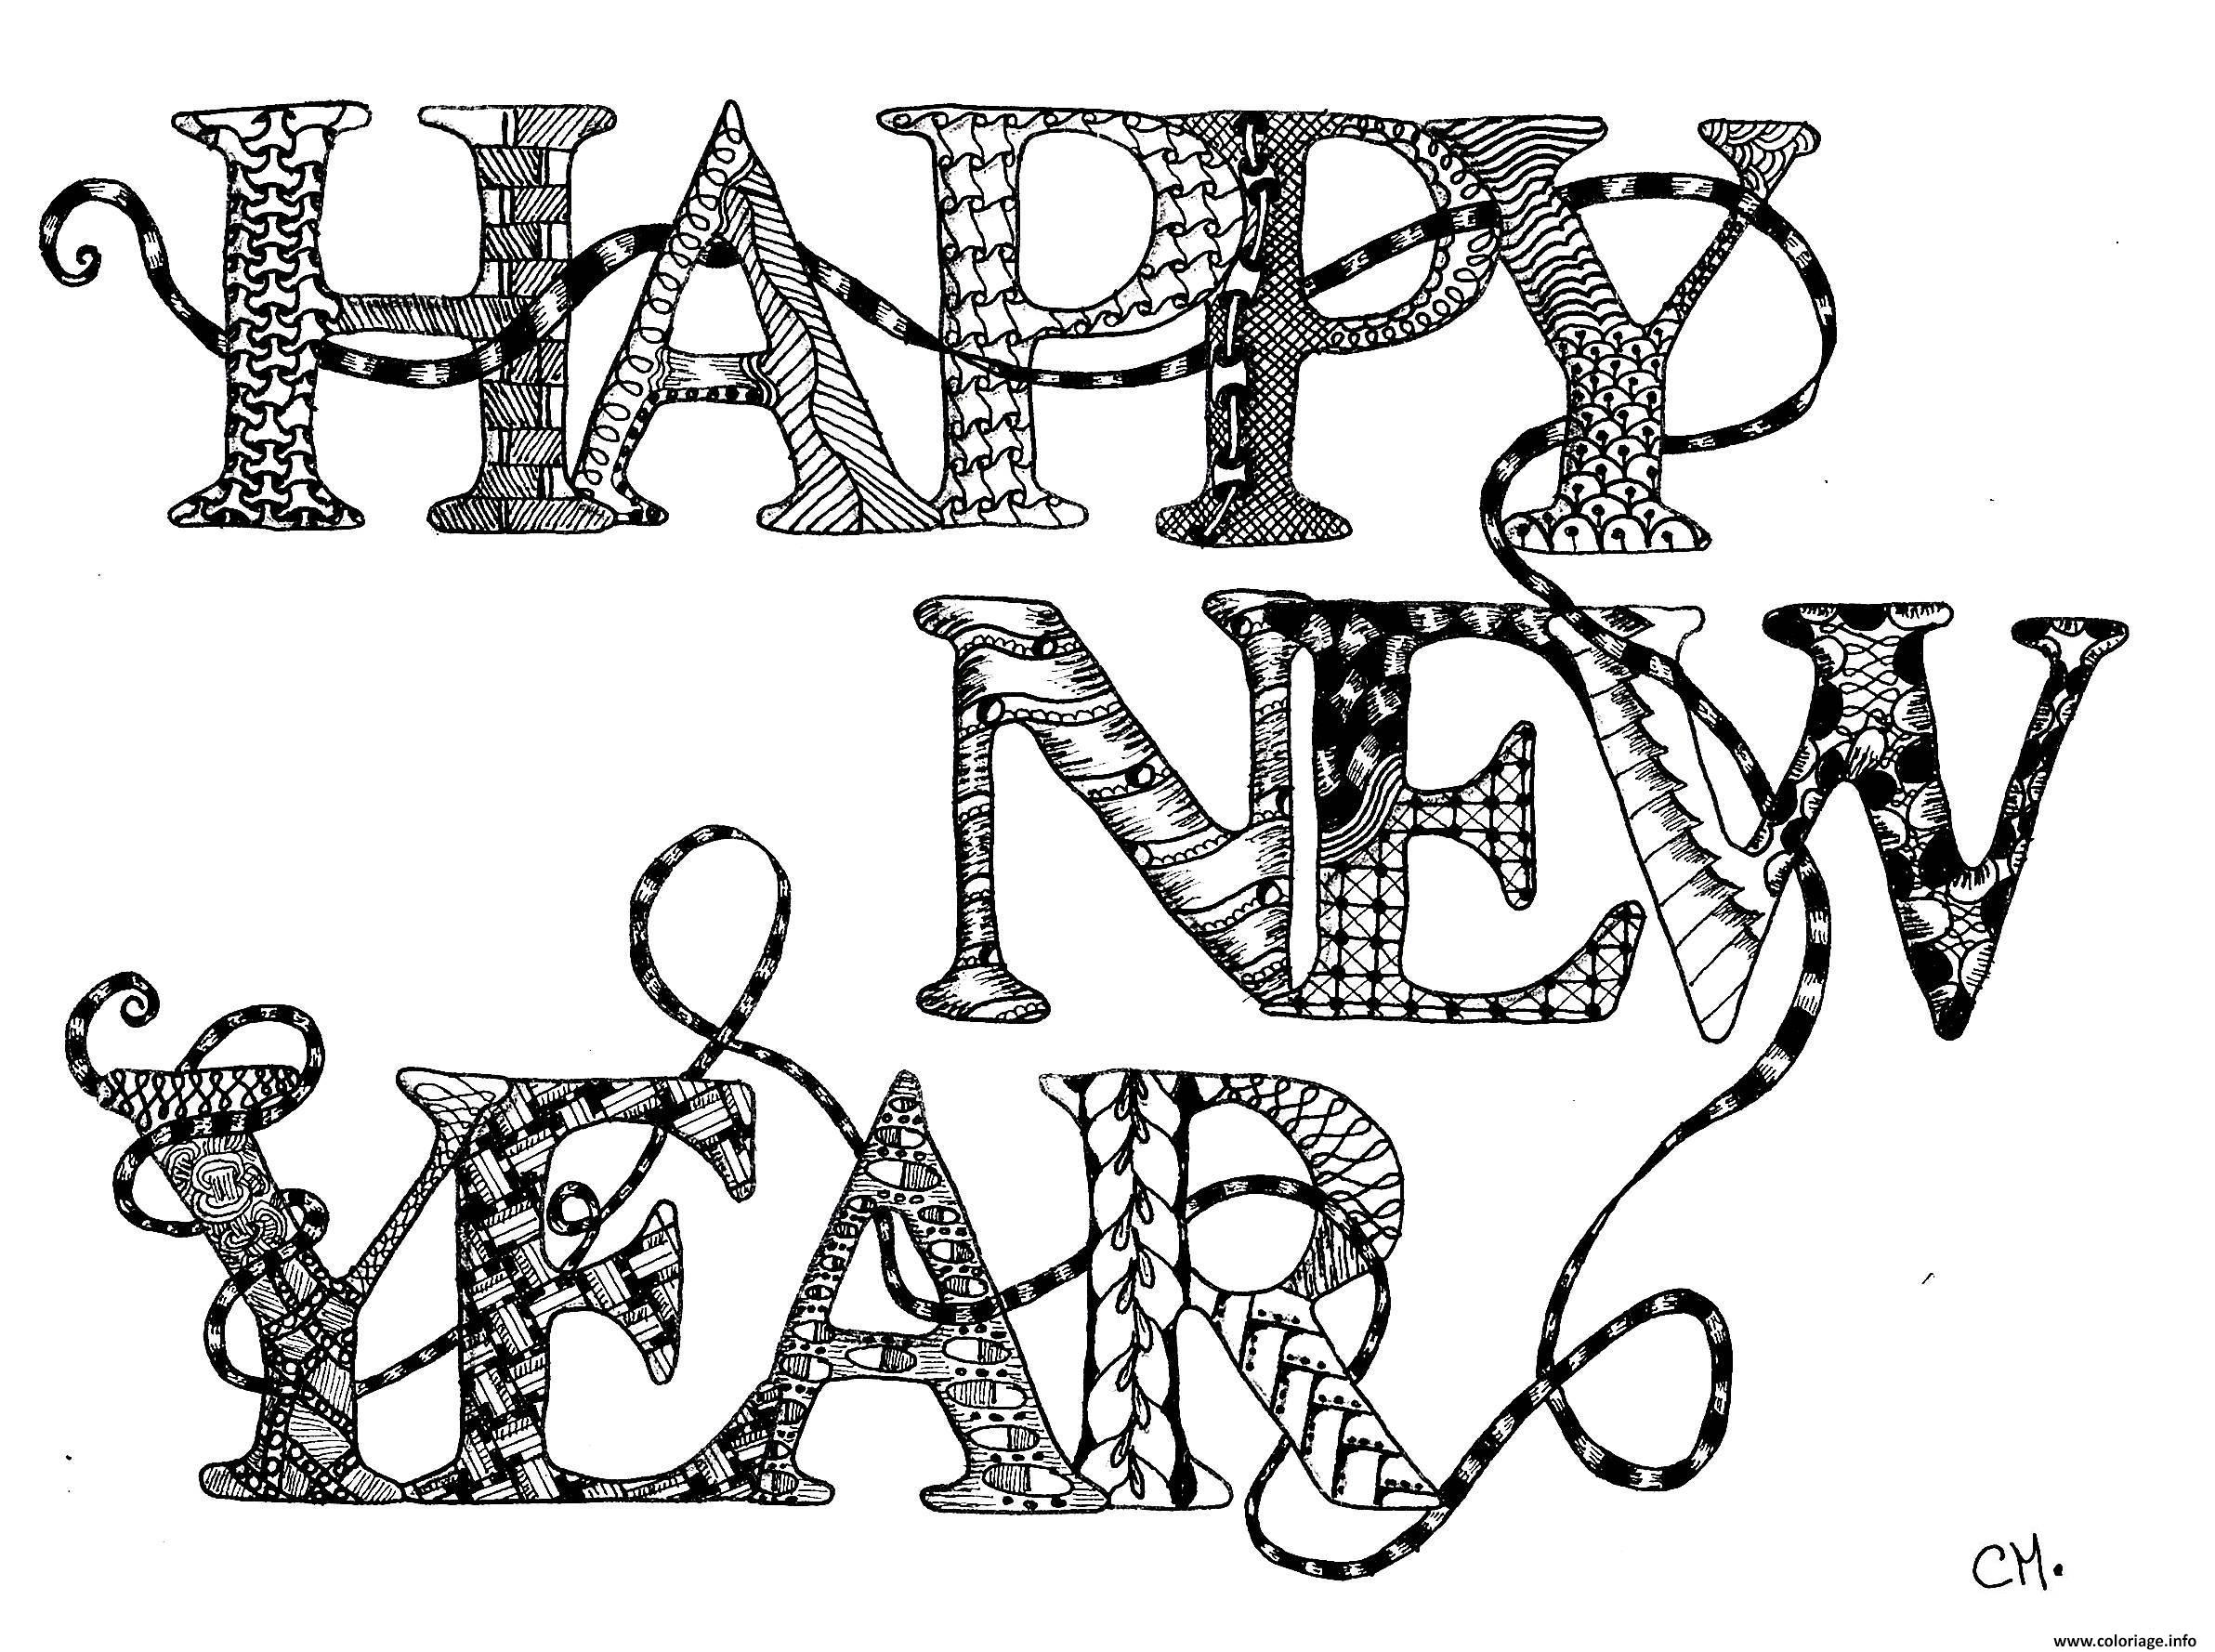 Dessin adulte zentangle happy new year by cathym Coloriage Gratuit à Imprimer